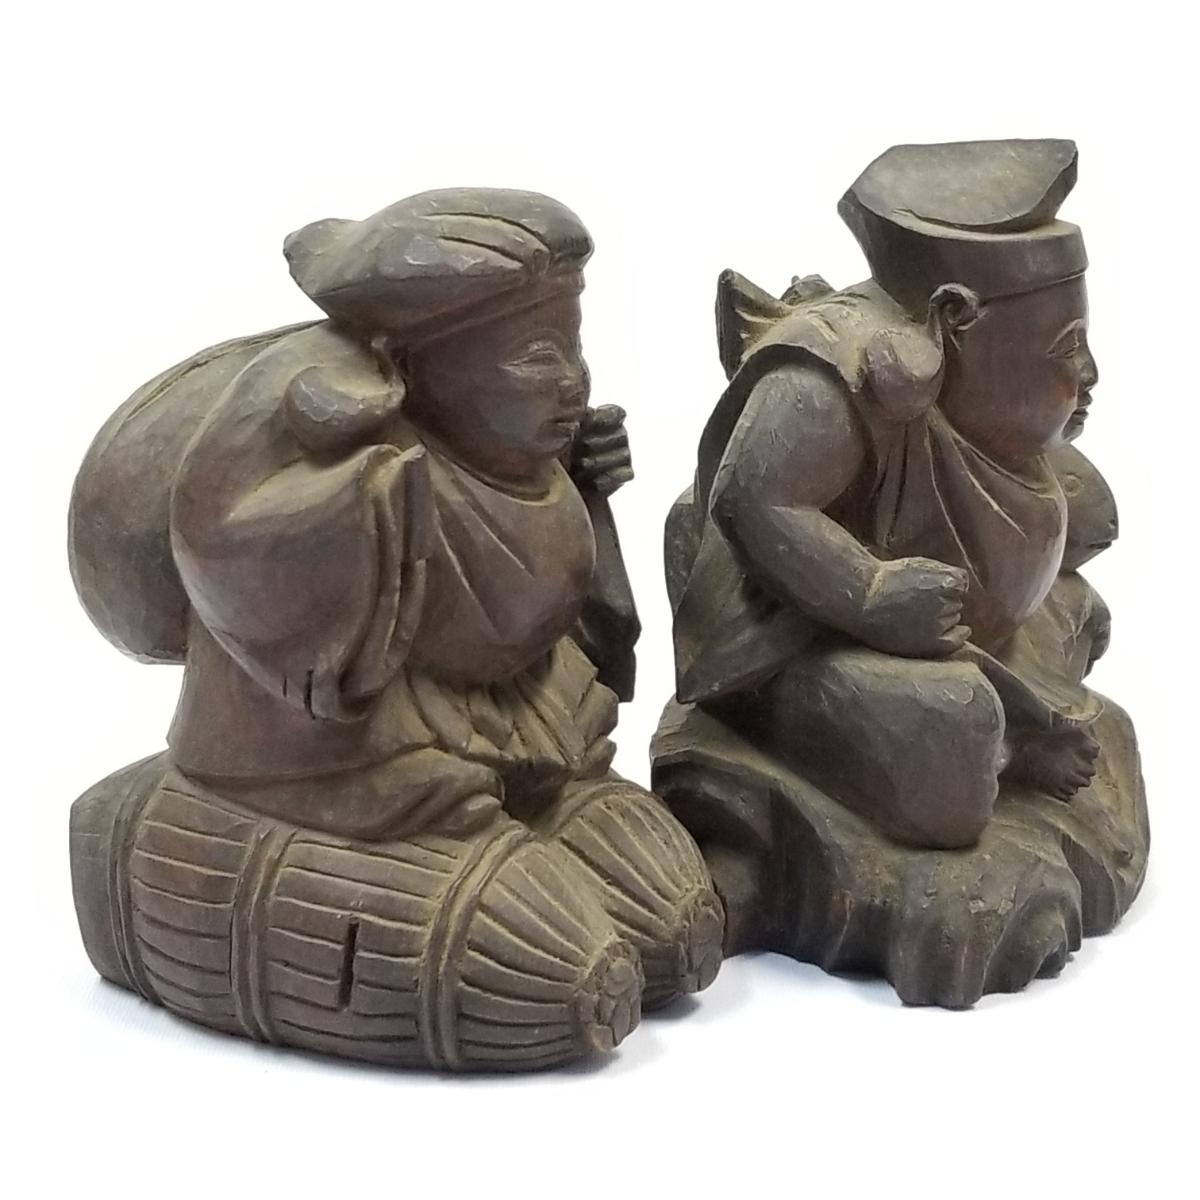 ◇時代物 木製 木彫り 彫刻 置物 恵比寿大黒 検索/ 仏具 仏像 寺院 宗教 東洋 中国美術 アンティーク (t5-3/1_画像2